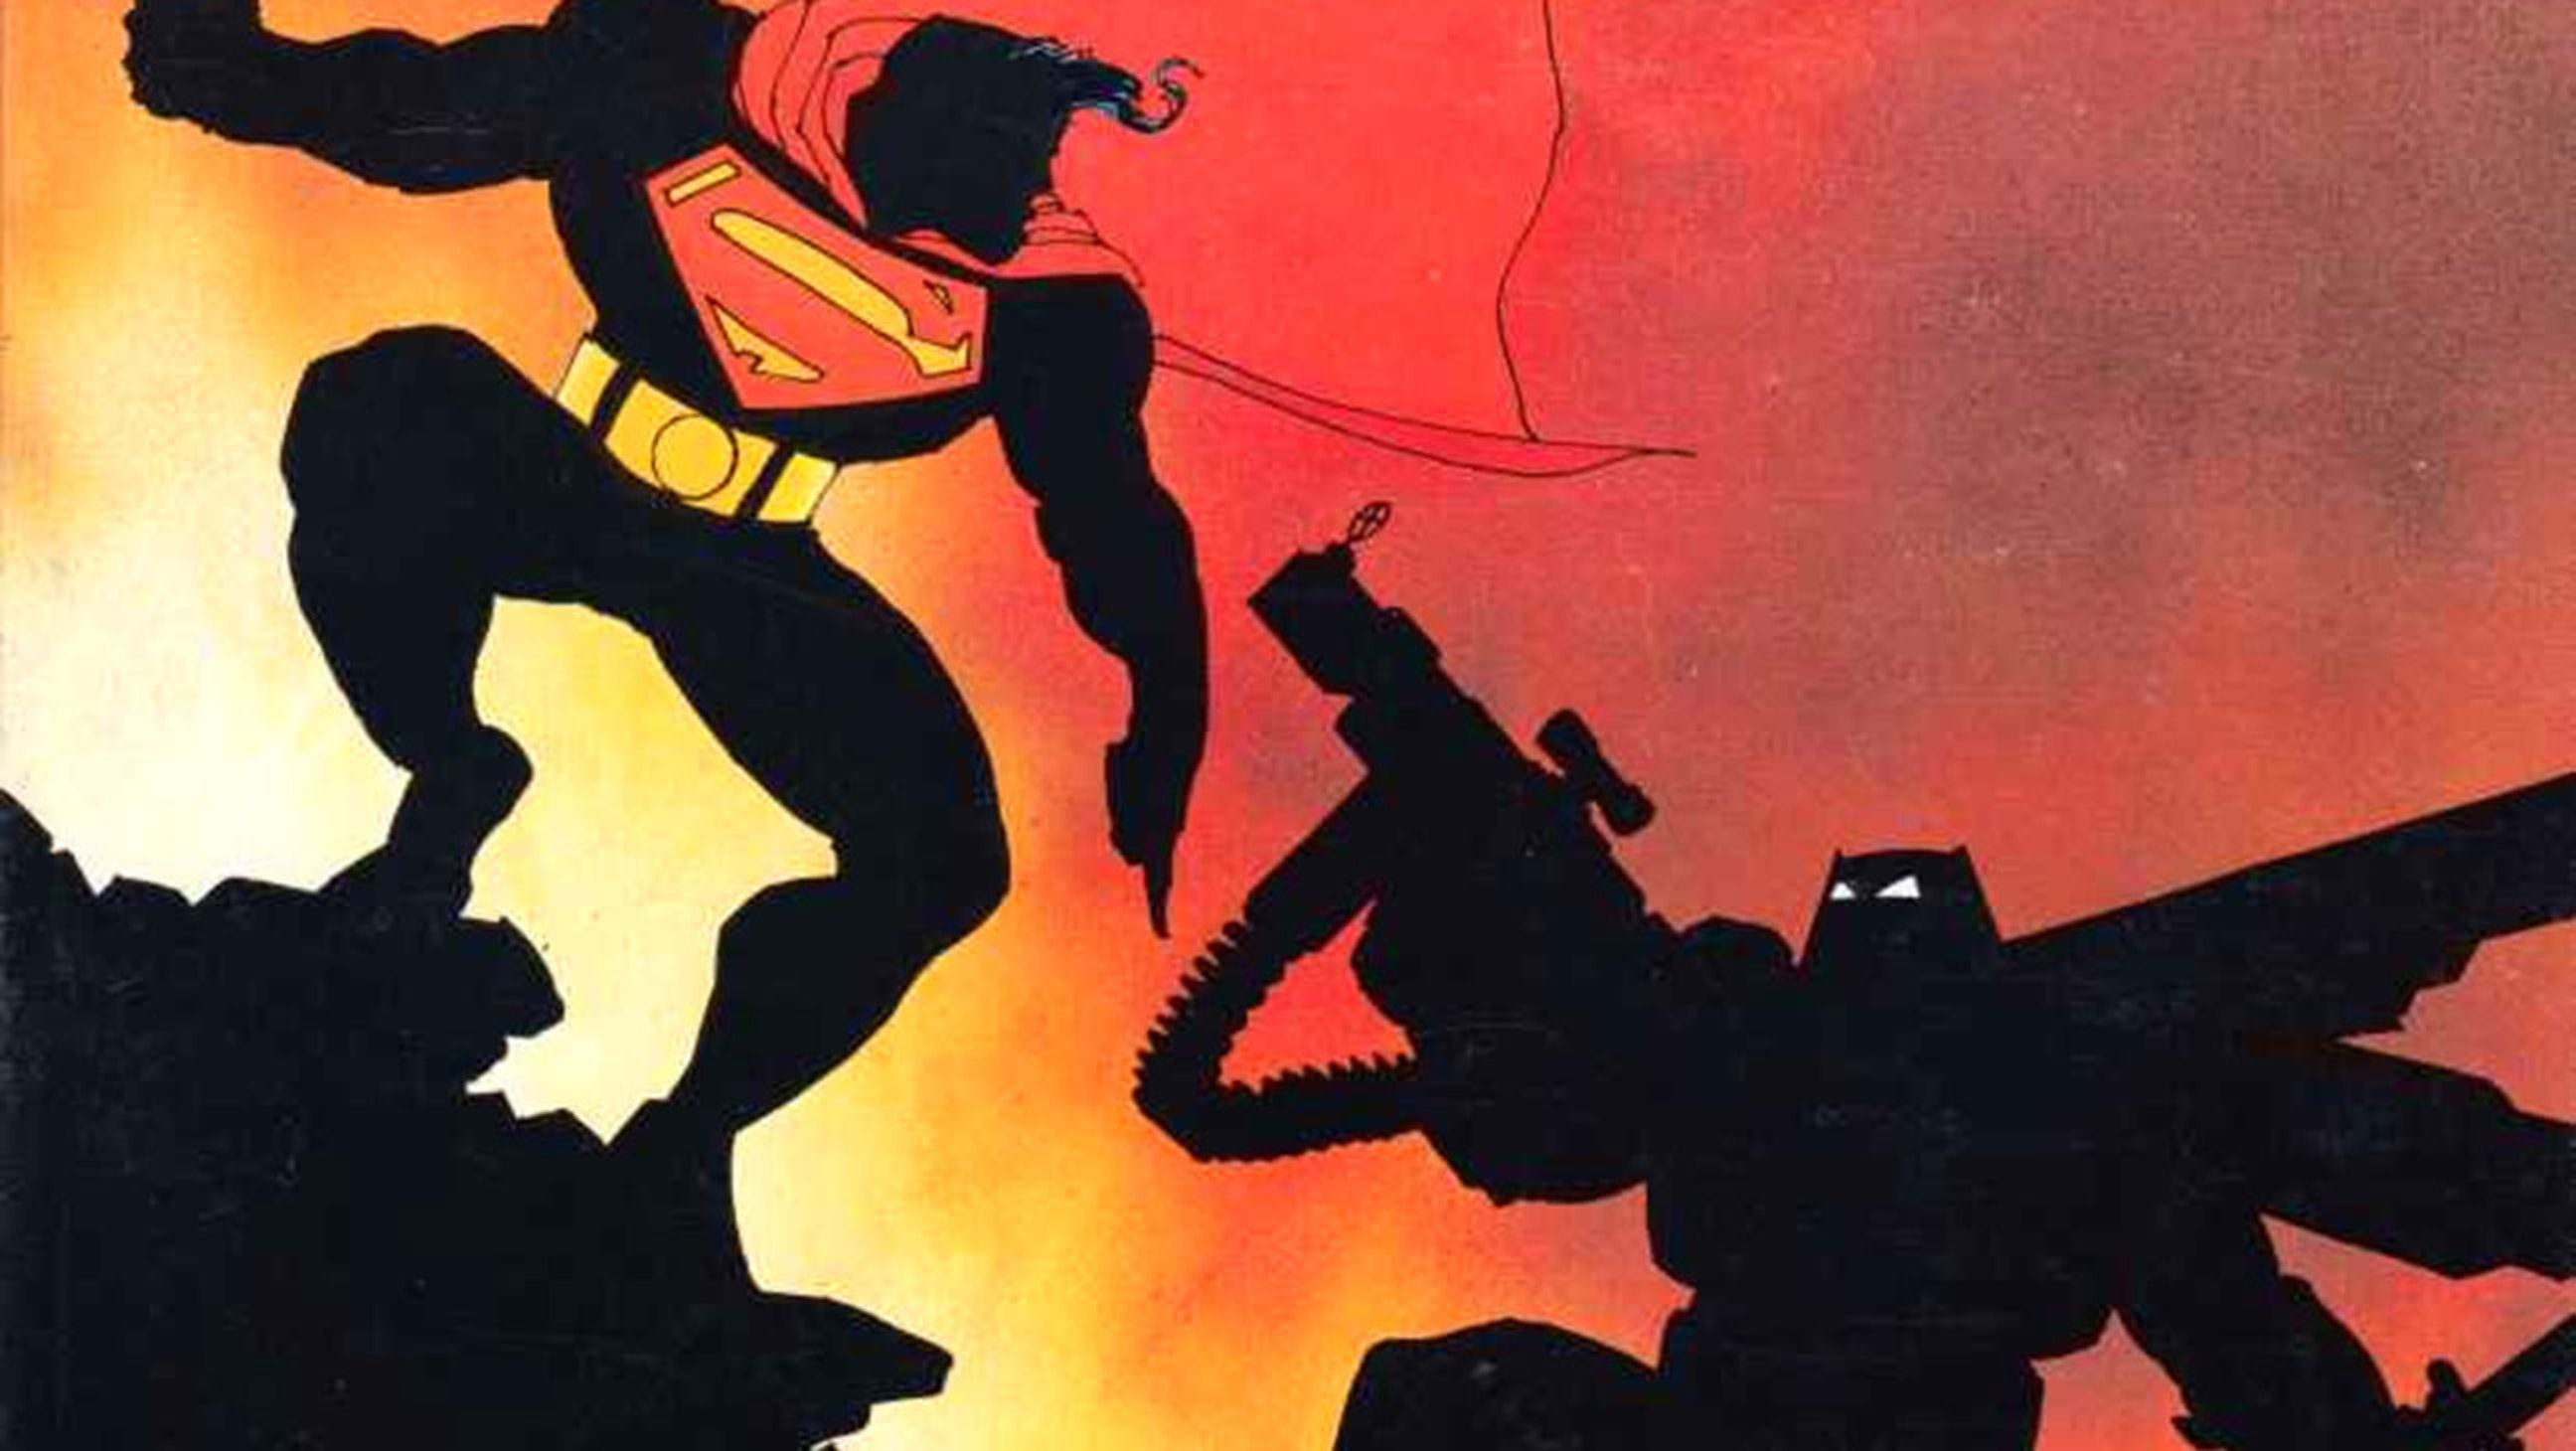 Frank Miller's version of Batman and Superman in 'Dark Knight' clash.